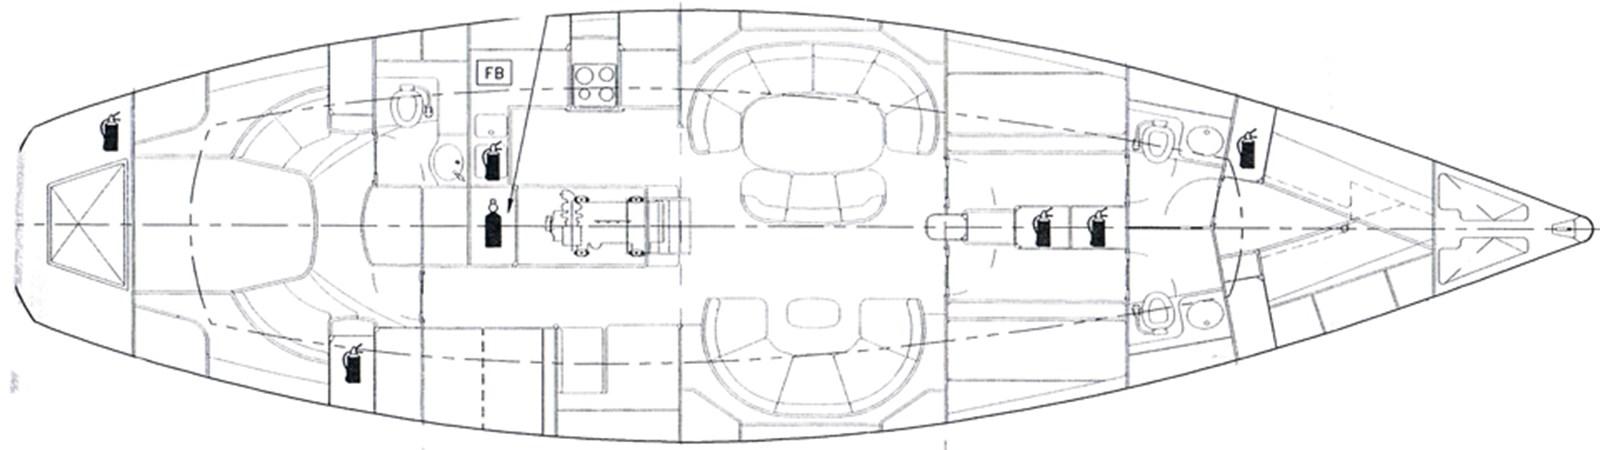 german-frers-60-layout-1 2000 SOUTHAMPTON YACHT SERVICES German Frers 60 Cruising Sailboat 2695495